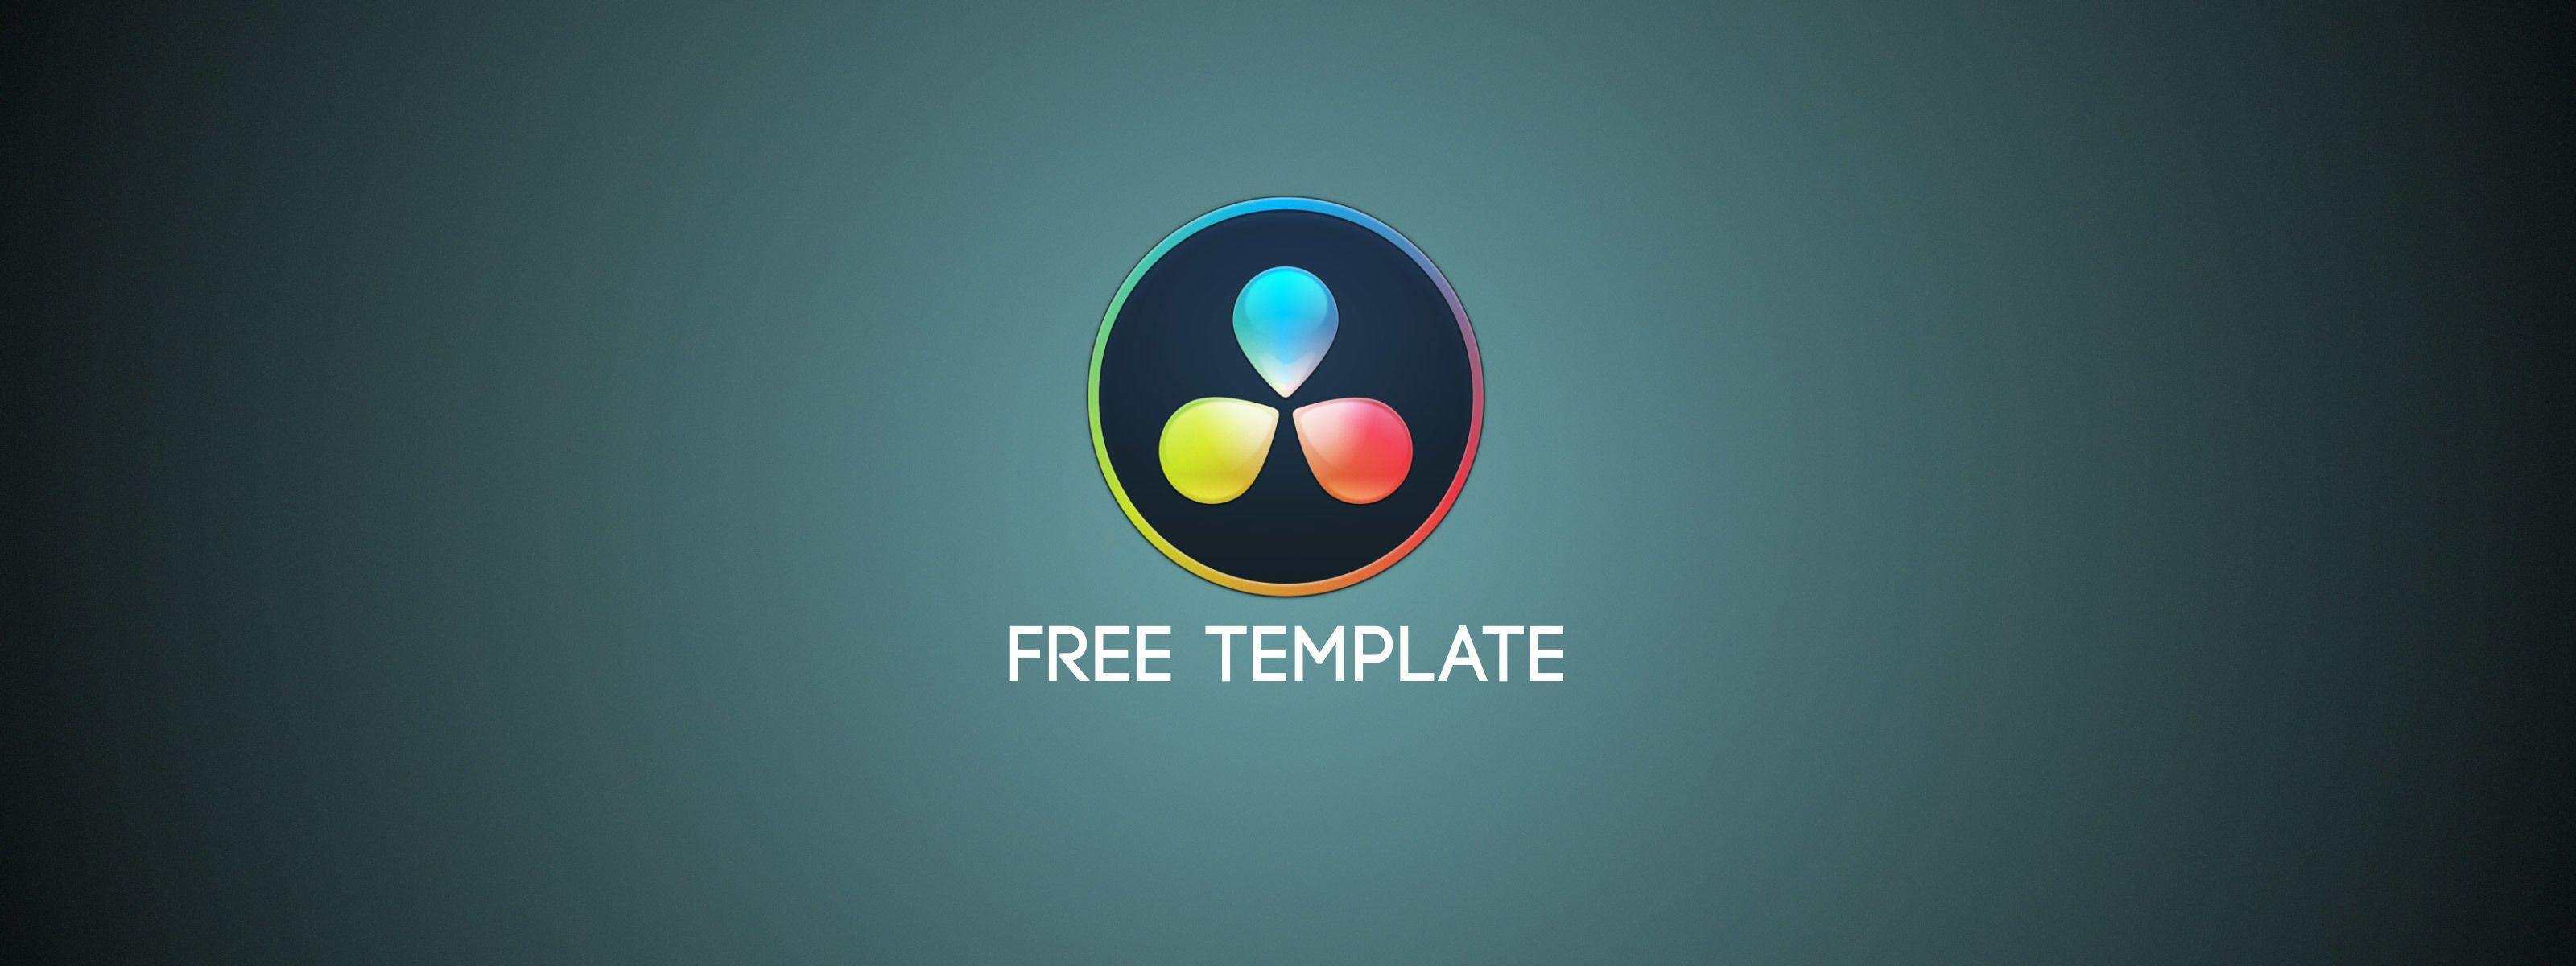 FREE DaVinci Resolve Title Template | New Tutorials And